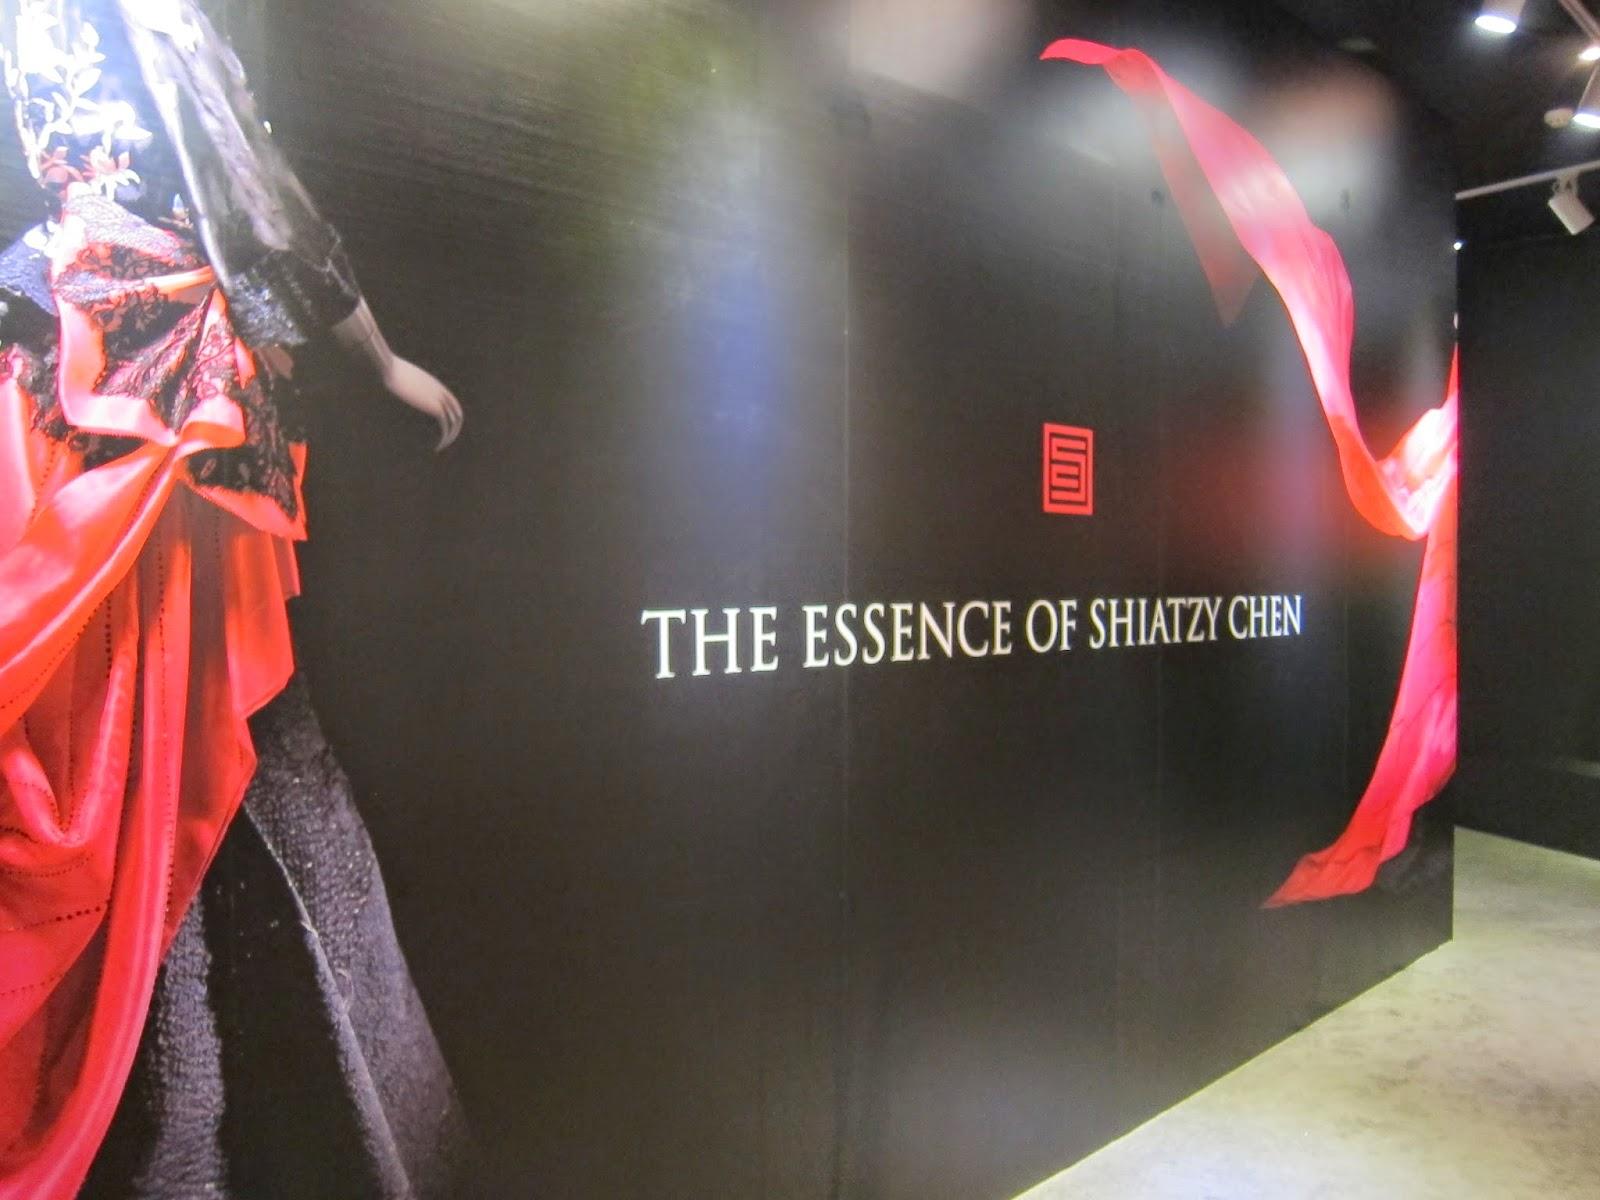 Exhibit: The Essence of Schiatzy Chen